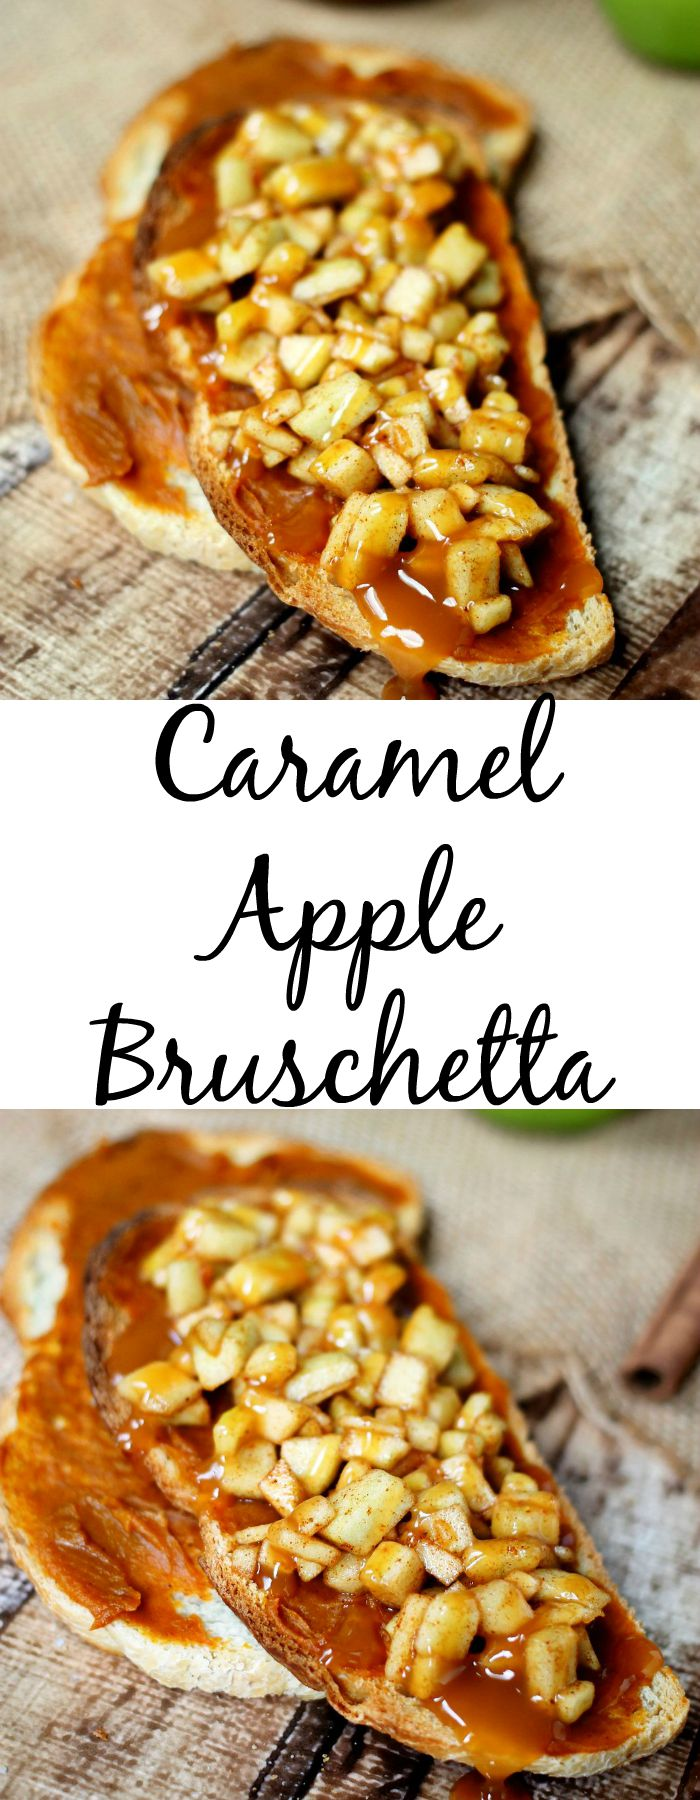 Caramel Apple Bruschetta